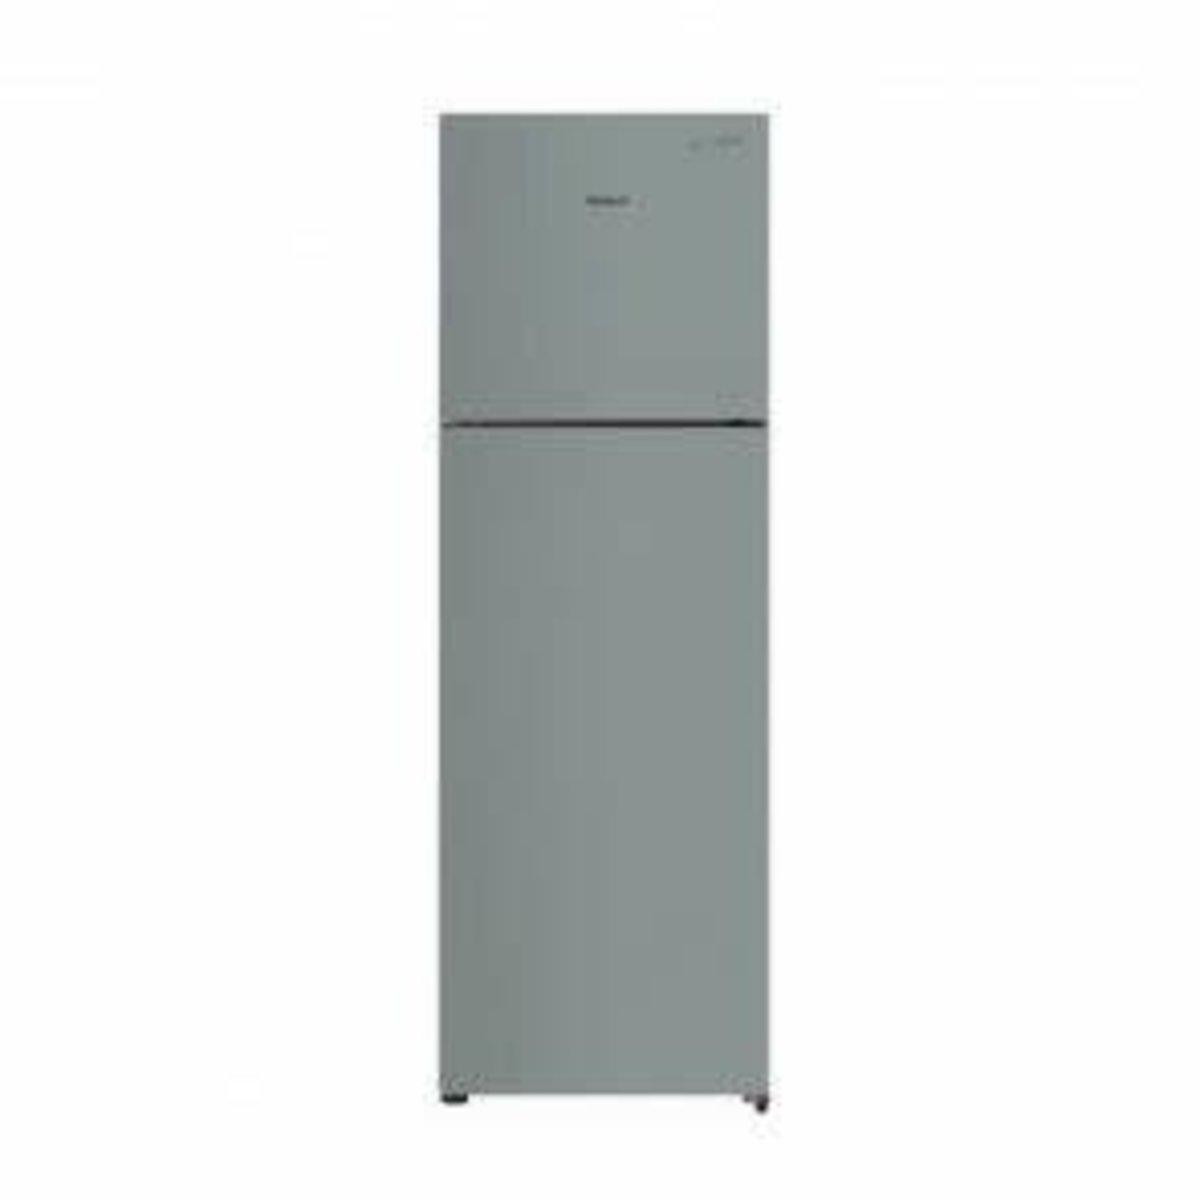 Whirlpool WF2T324LPS Refrigerator Platinum-Silver